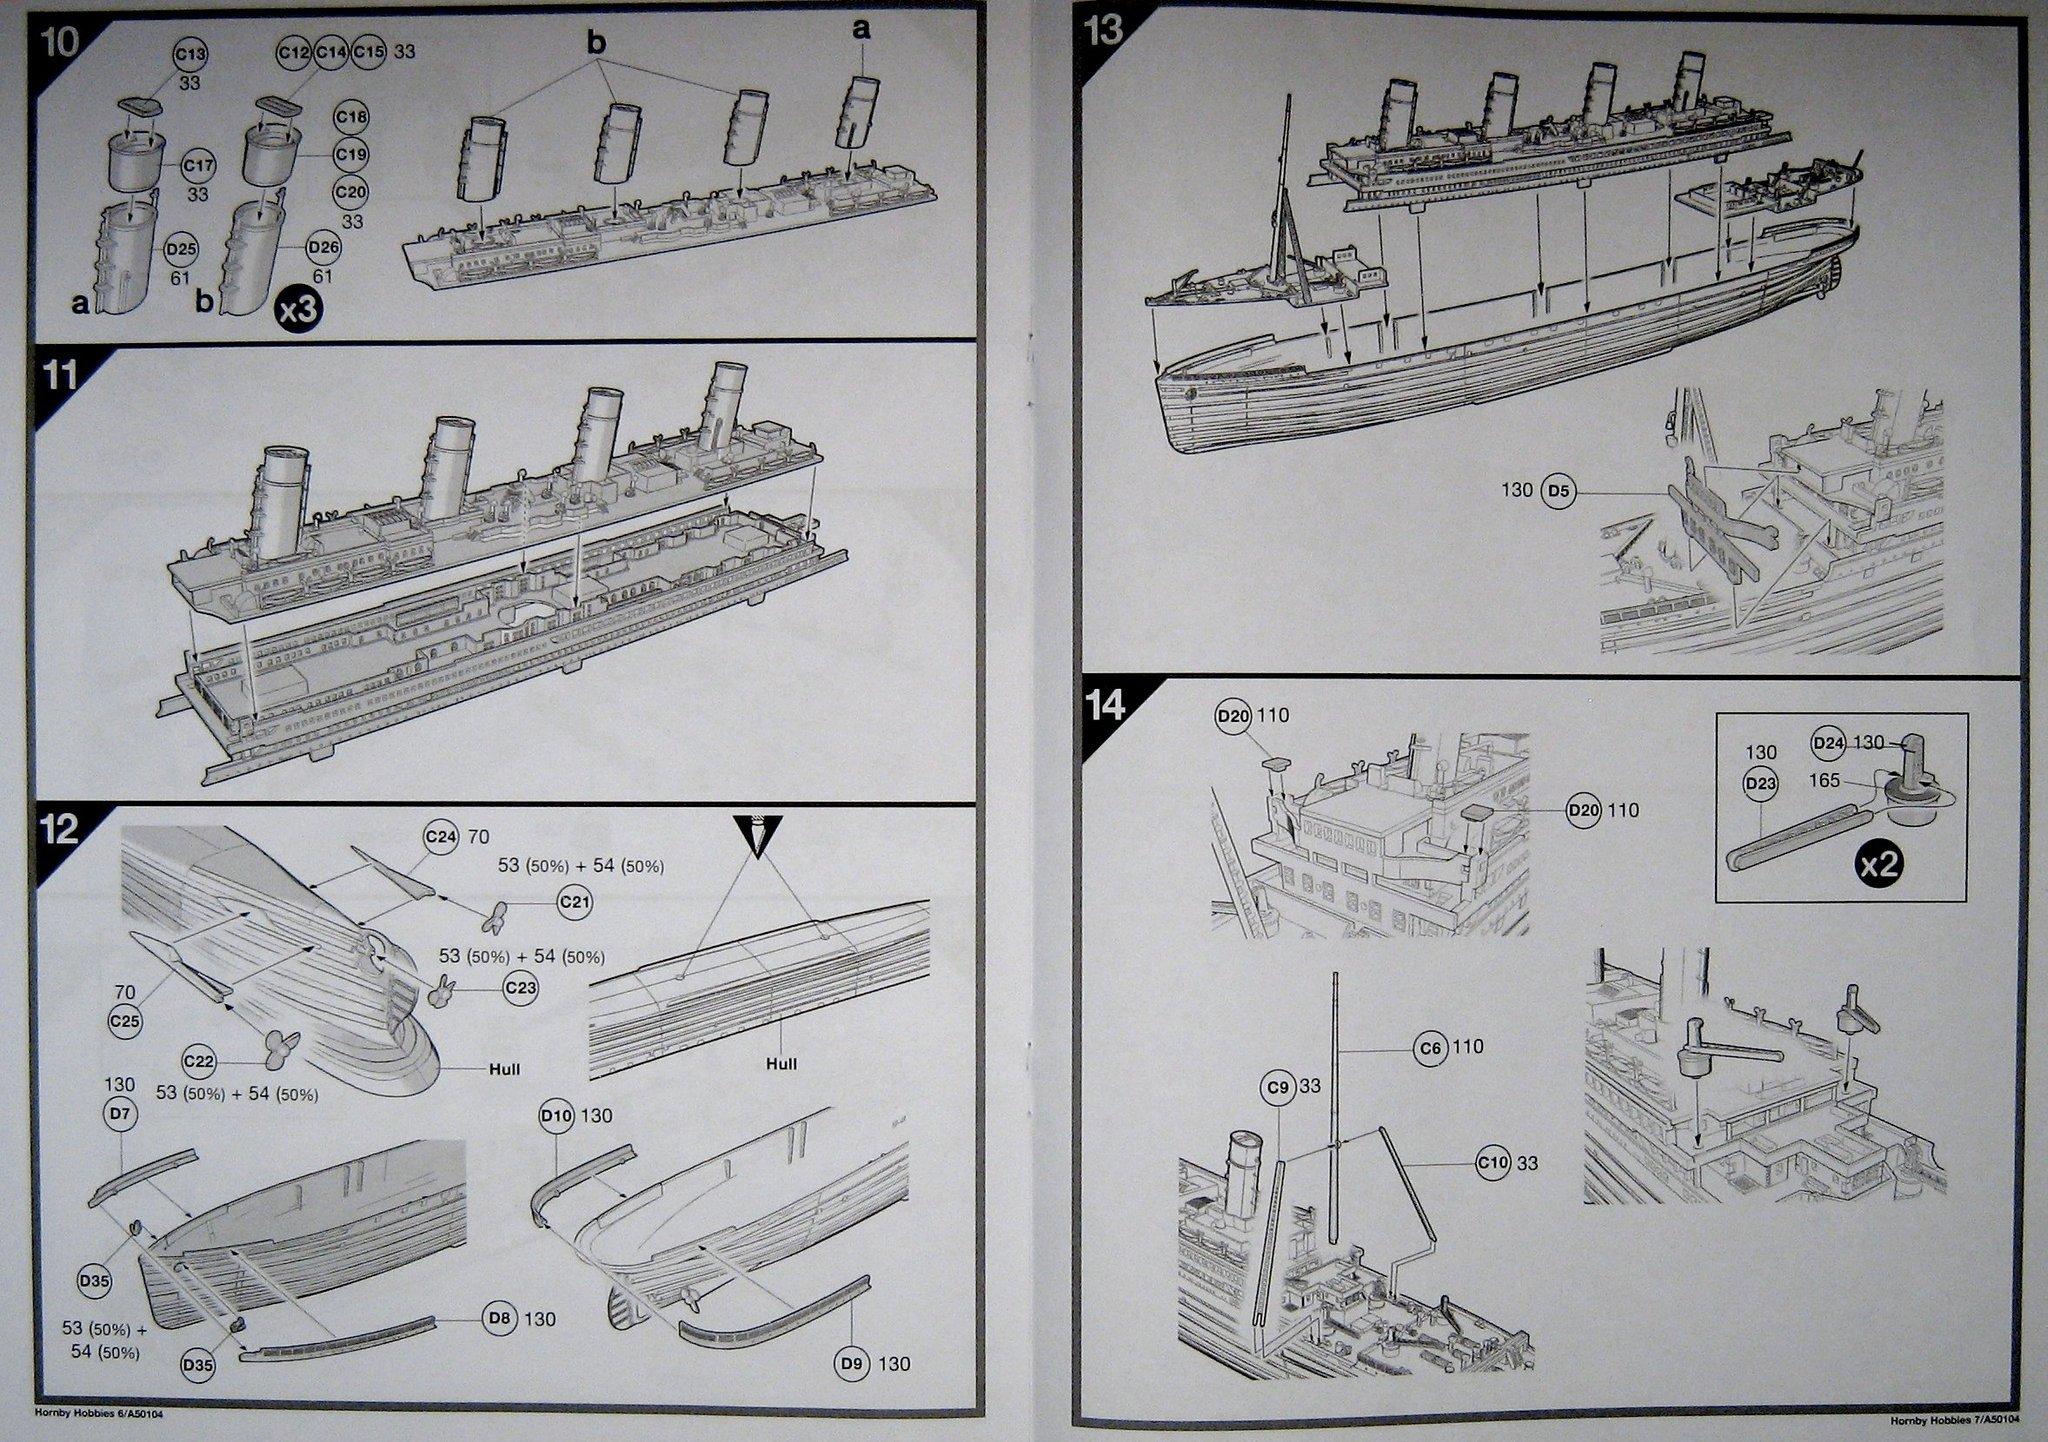 Titanic Gift Rms Xotuziwpk Set Airfix 50104 GVUMqpSz